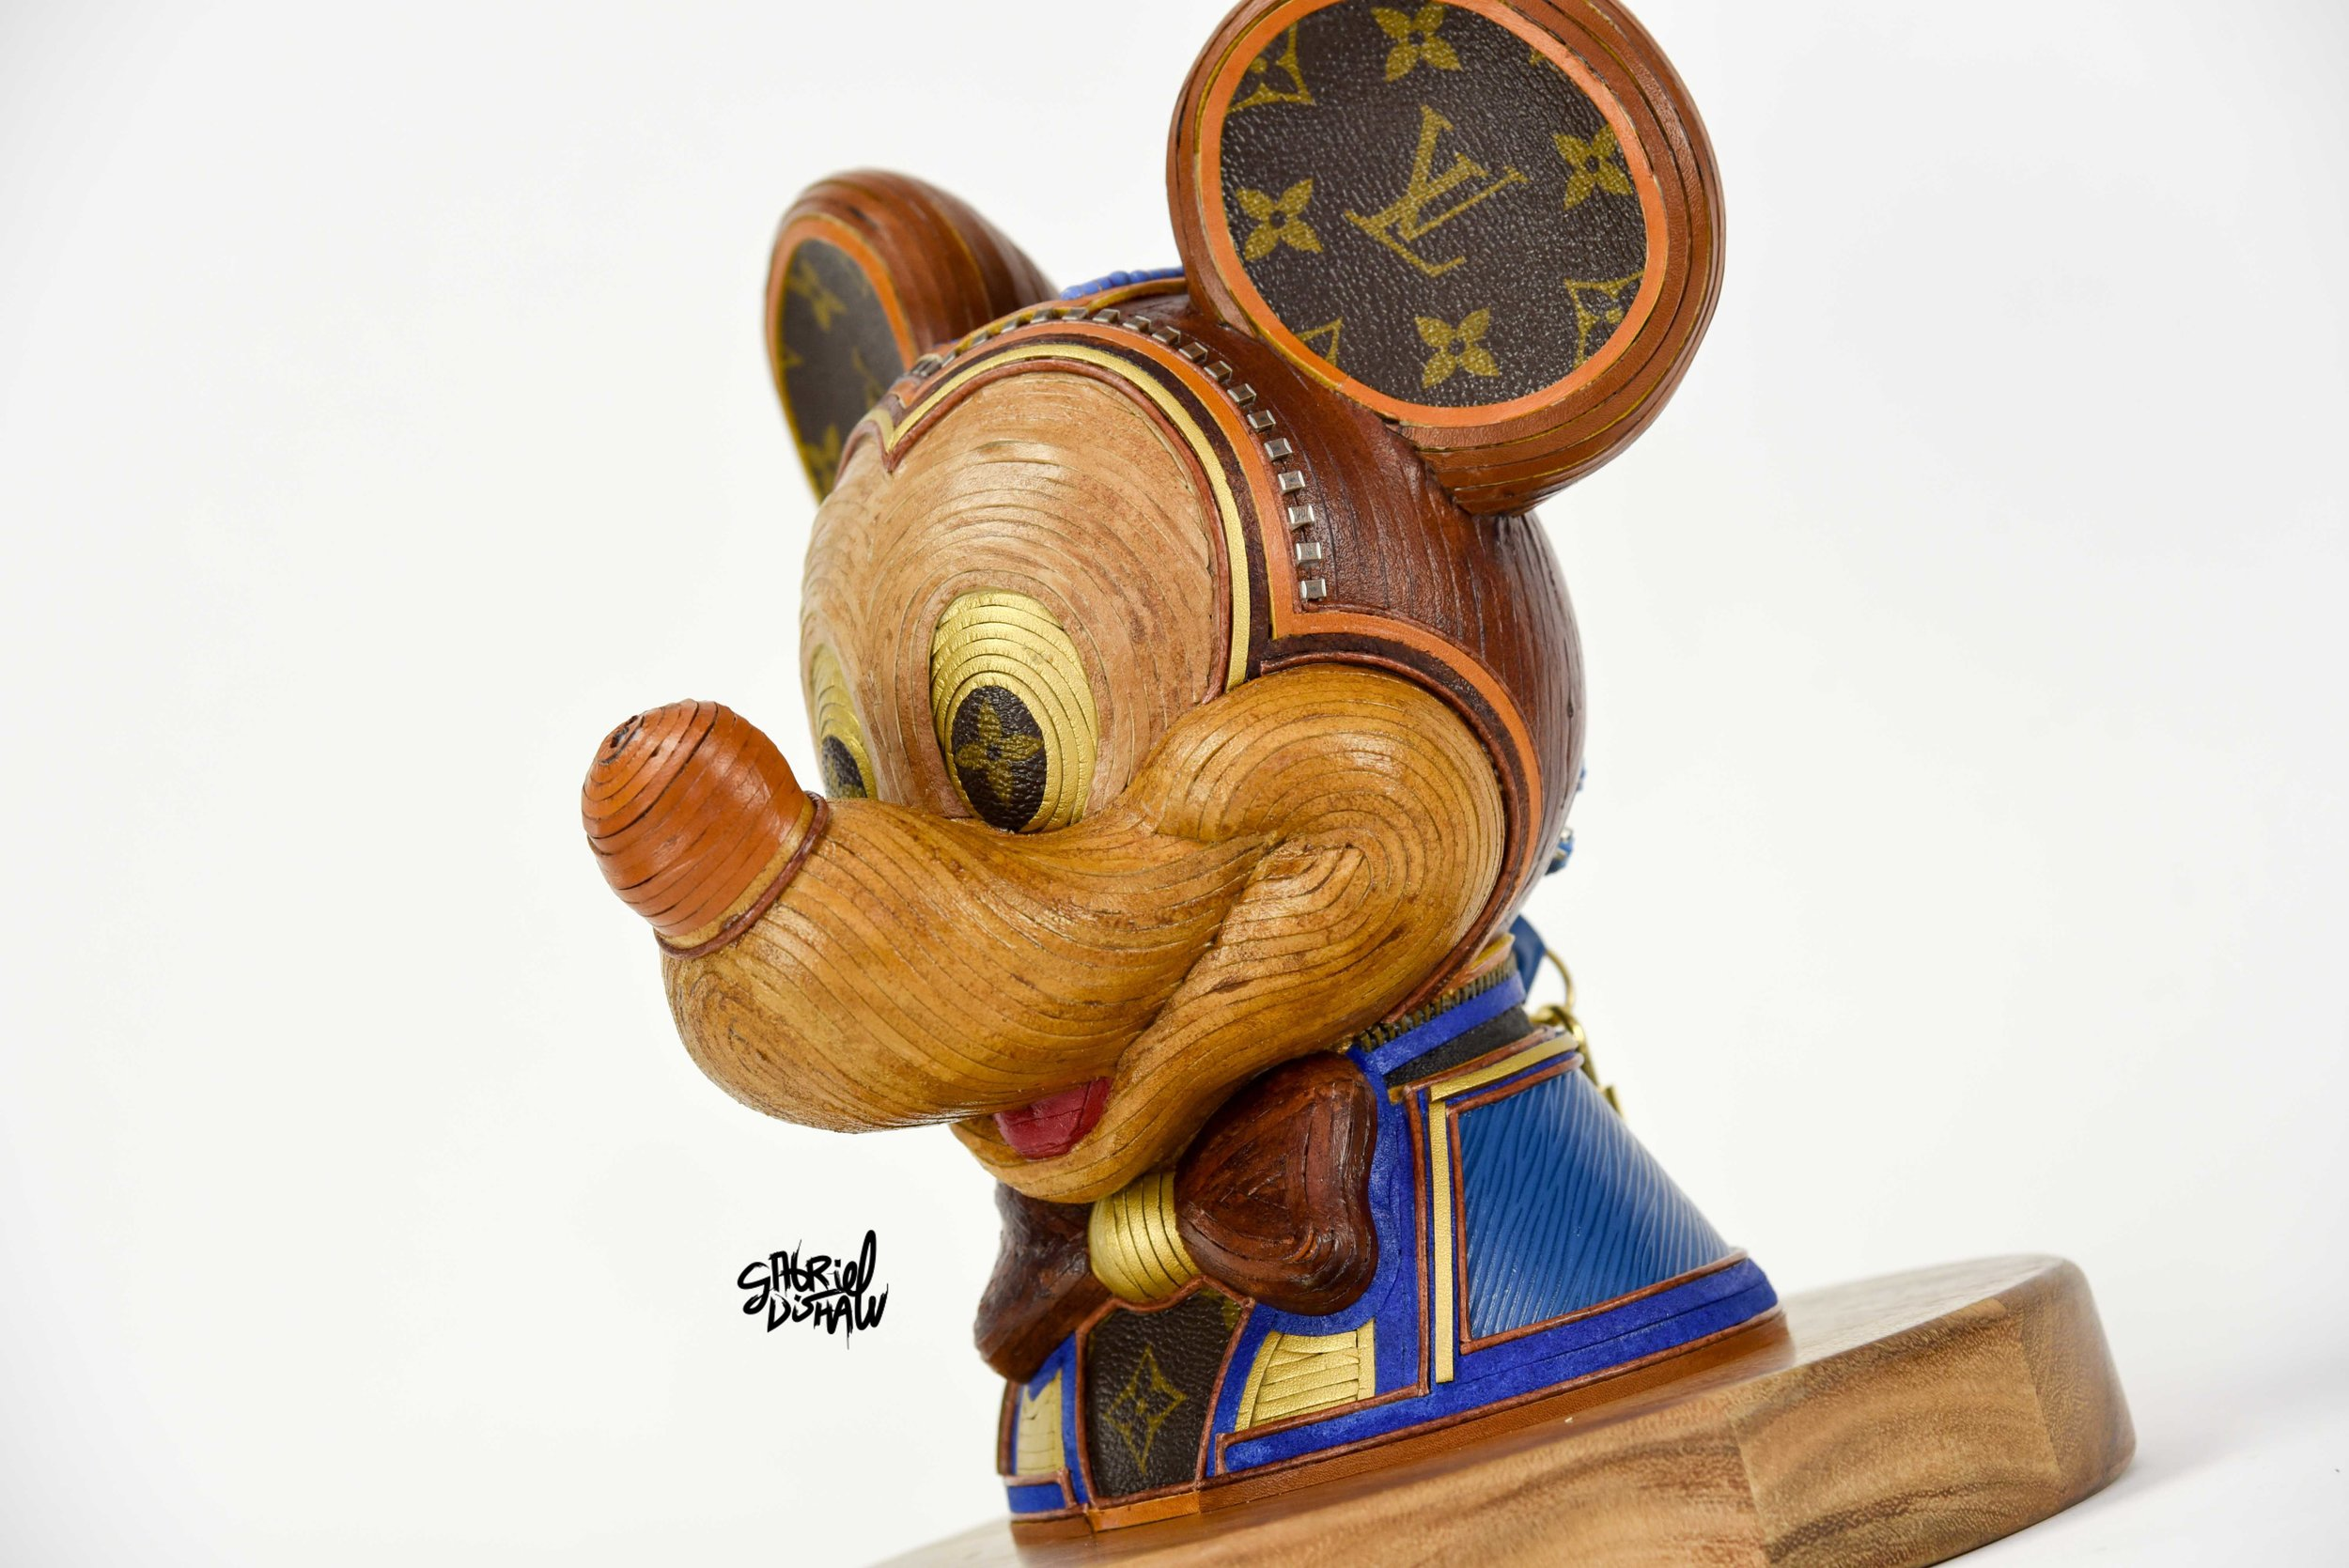 Disney Inspired Gallery -